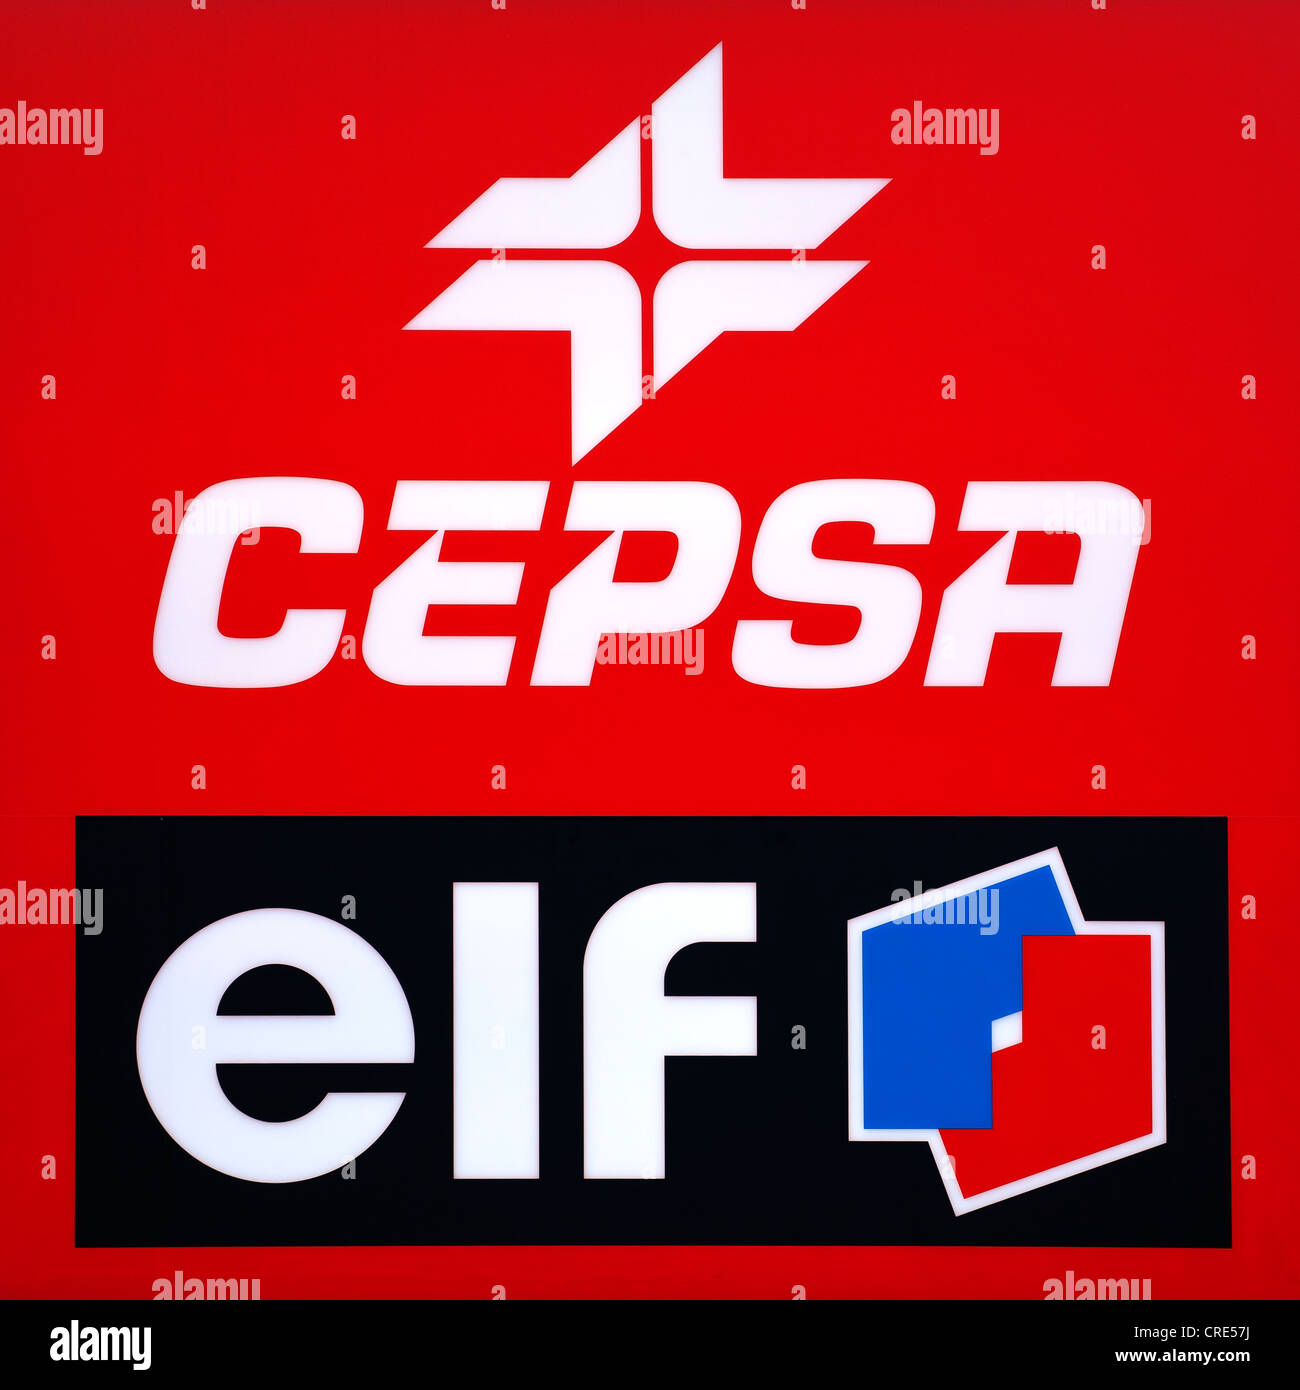 Logos and logotypes of the Spanish oil company Cepsa, Compania Espanola de Petroleos, and the French oil company - Stock Image